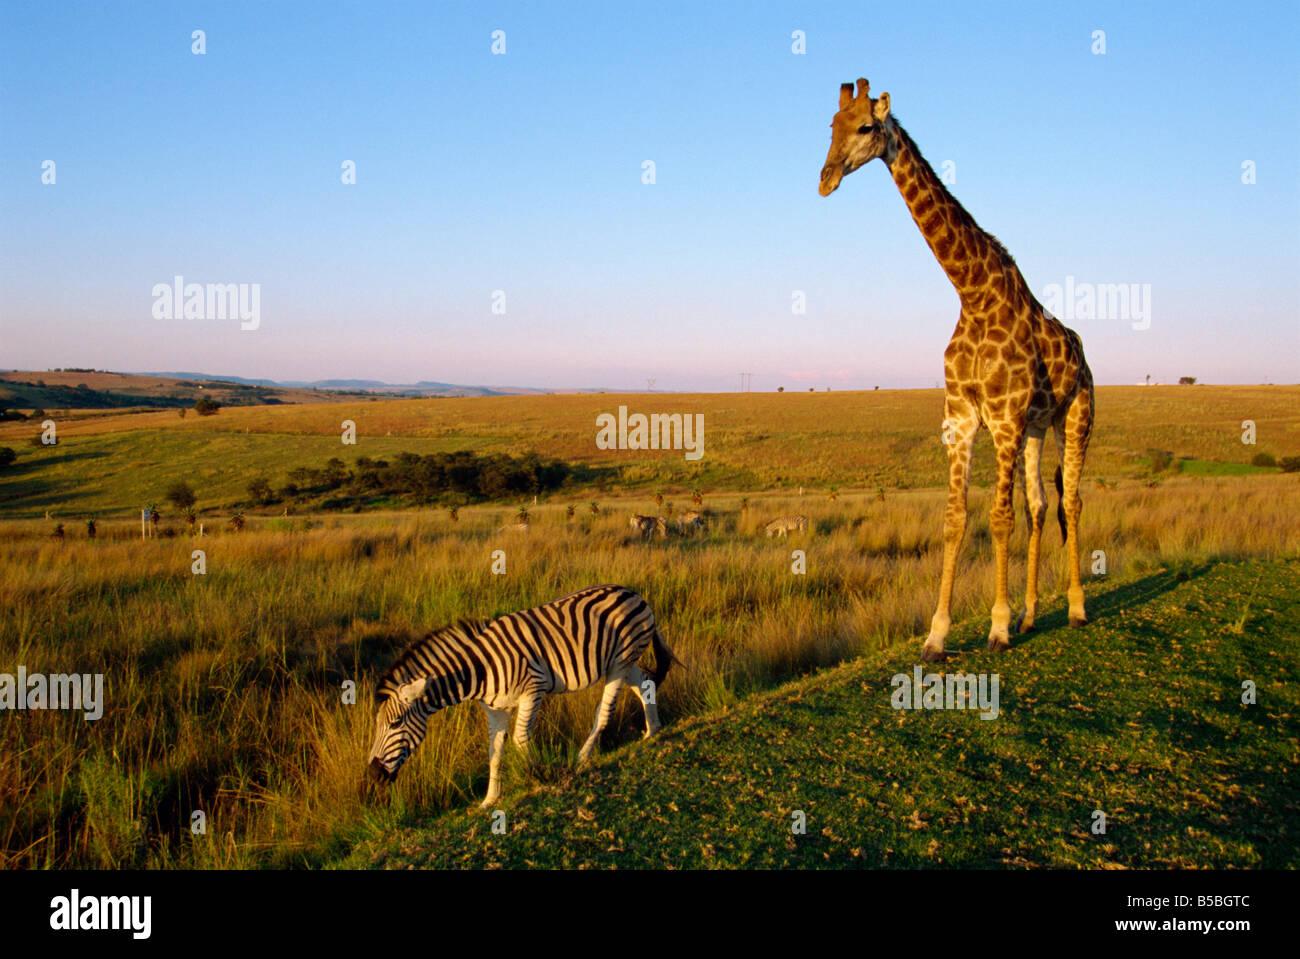 Giraffe and Zebra Kruger National Park South Africa A Evrard - Stock Image